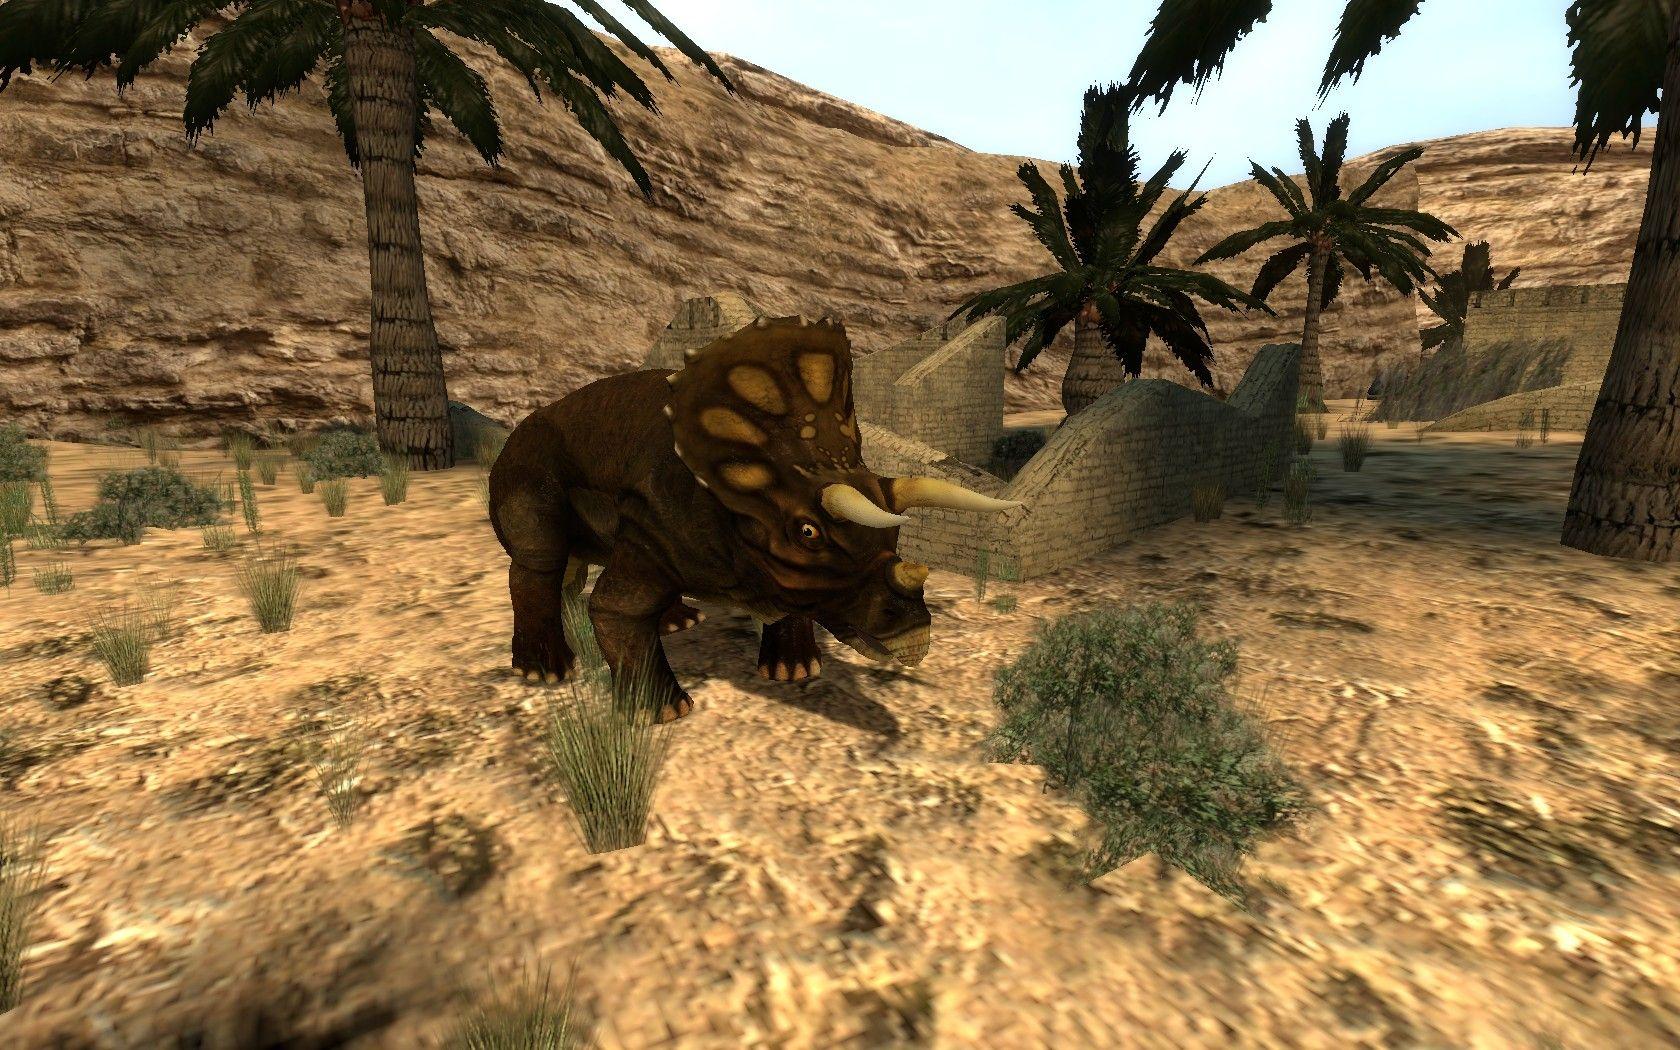 Triceratops NPC addon - Garry's Mod - Mod DB